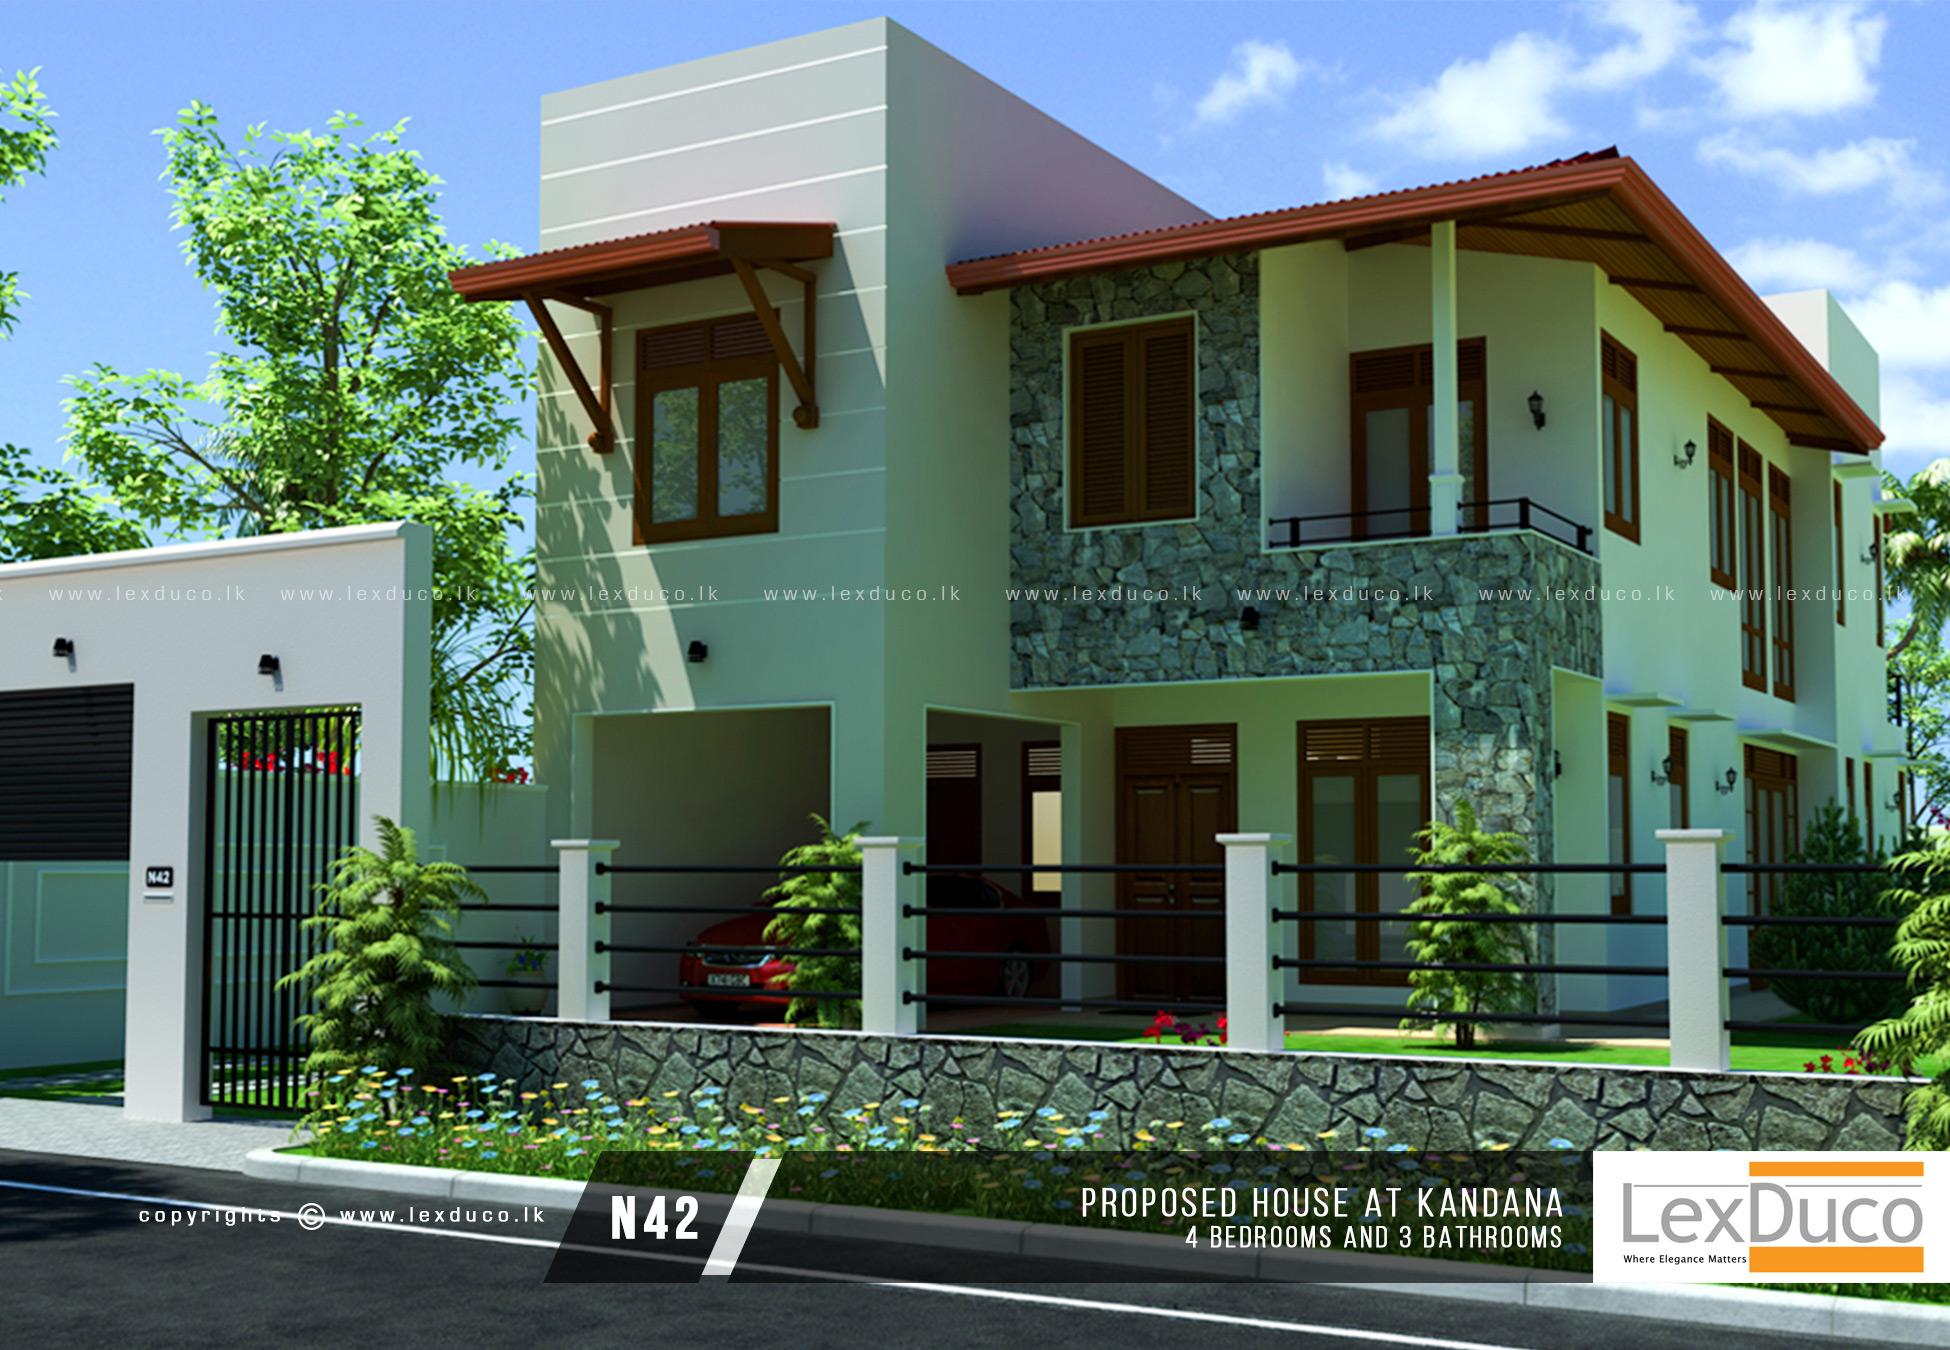 #1 House Builders in Sri Lanka | #1 in Home Construction